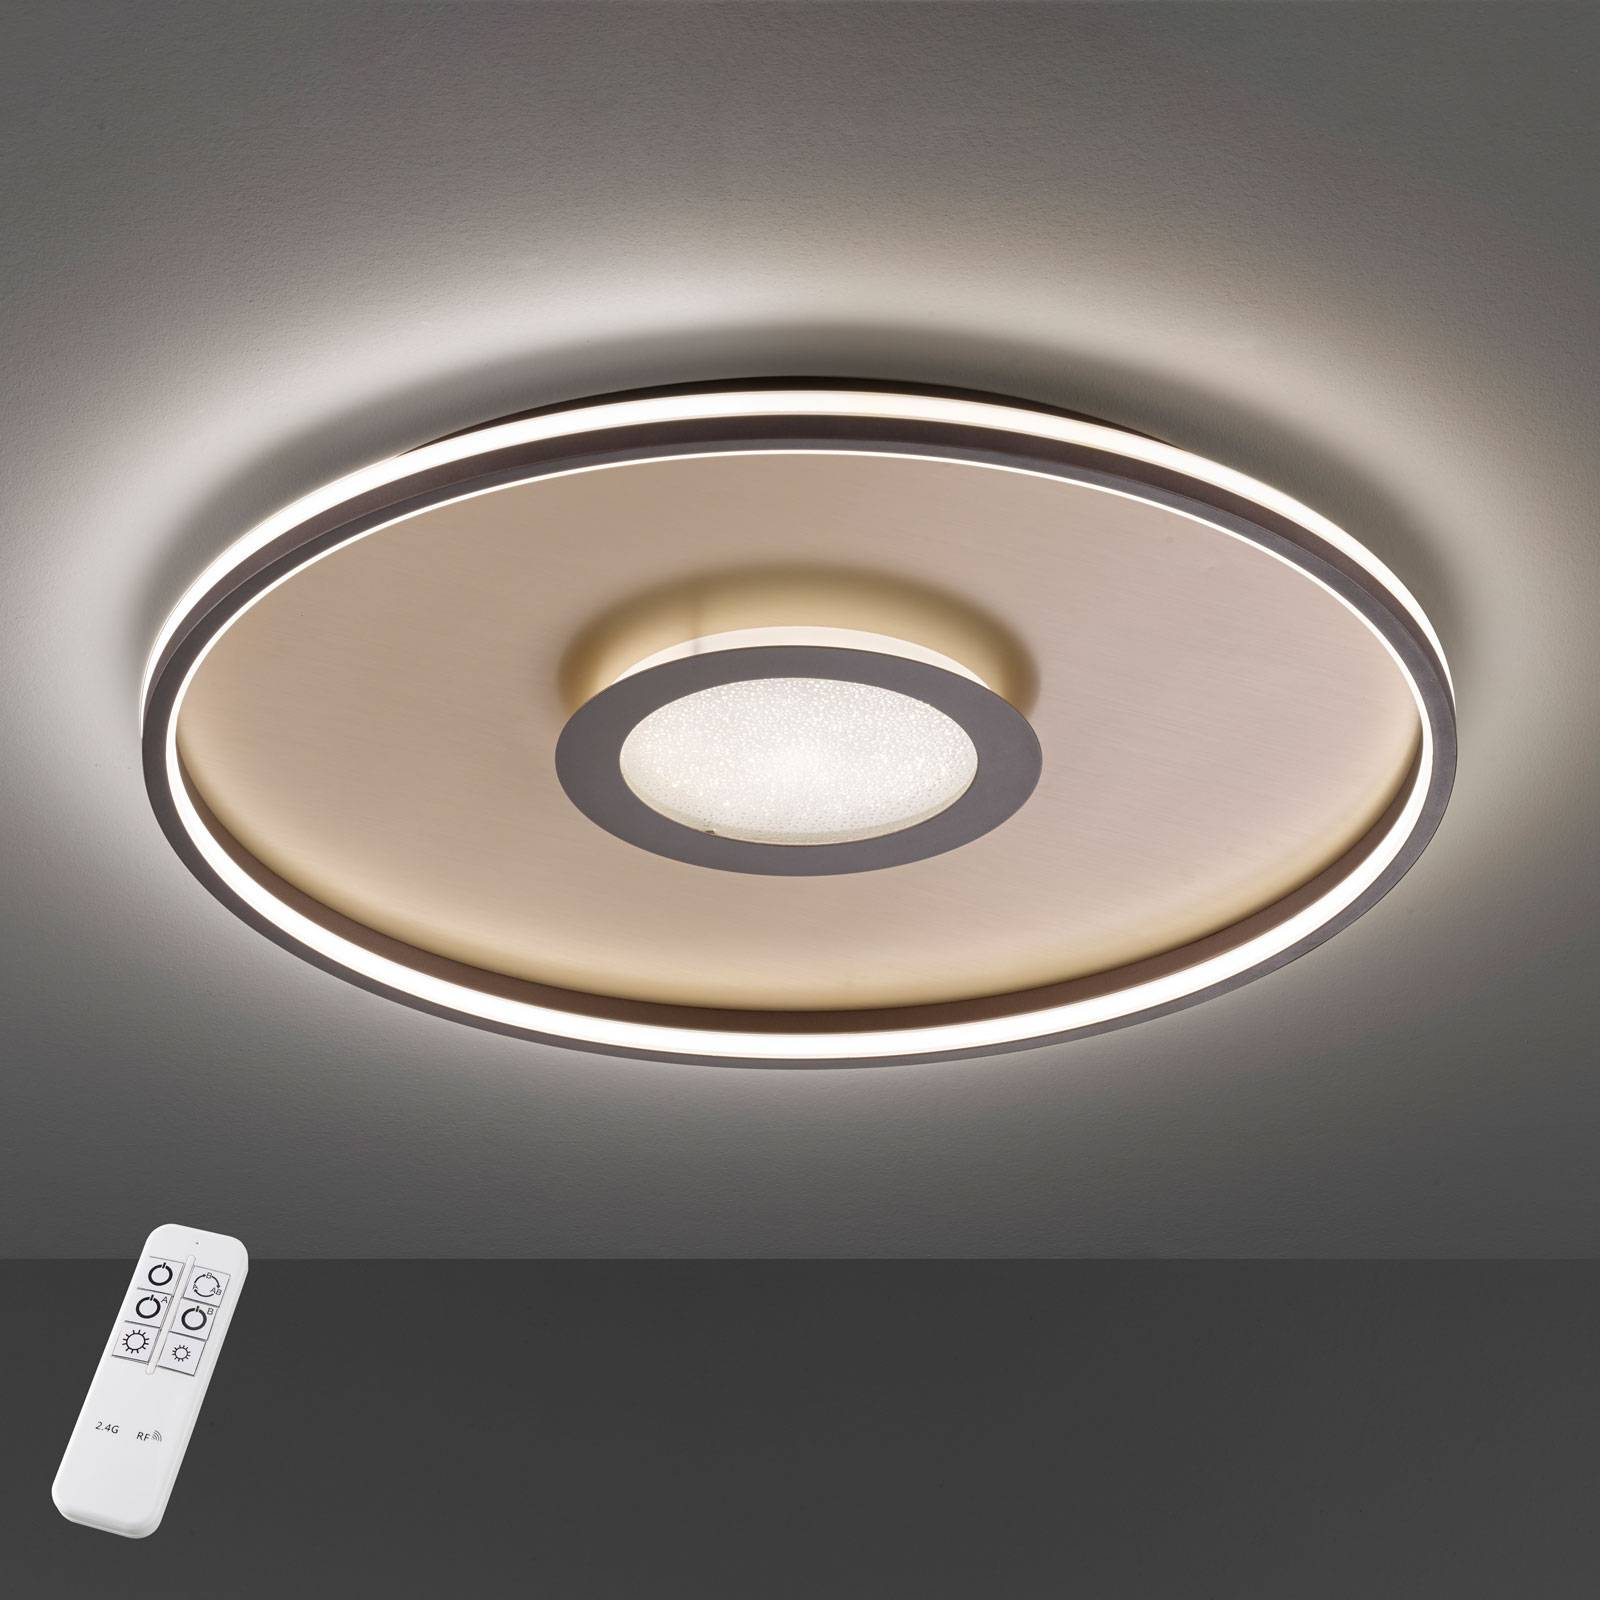 Bug-LED-kattovalaisin, pyöreä, ruoste, 60 cm